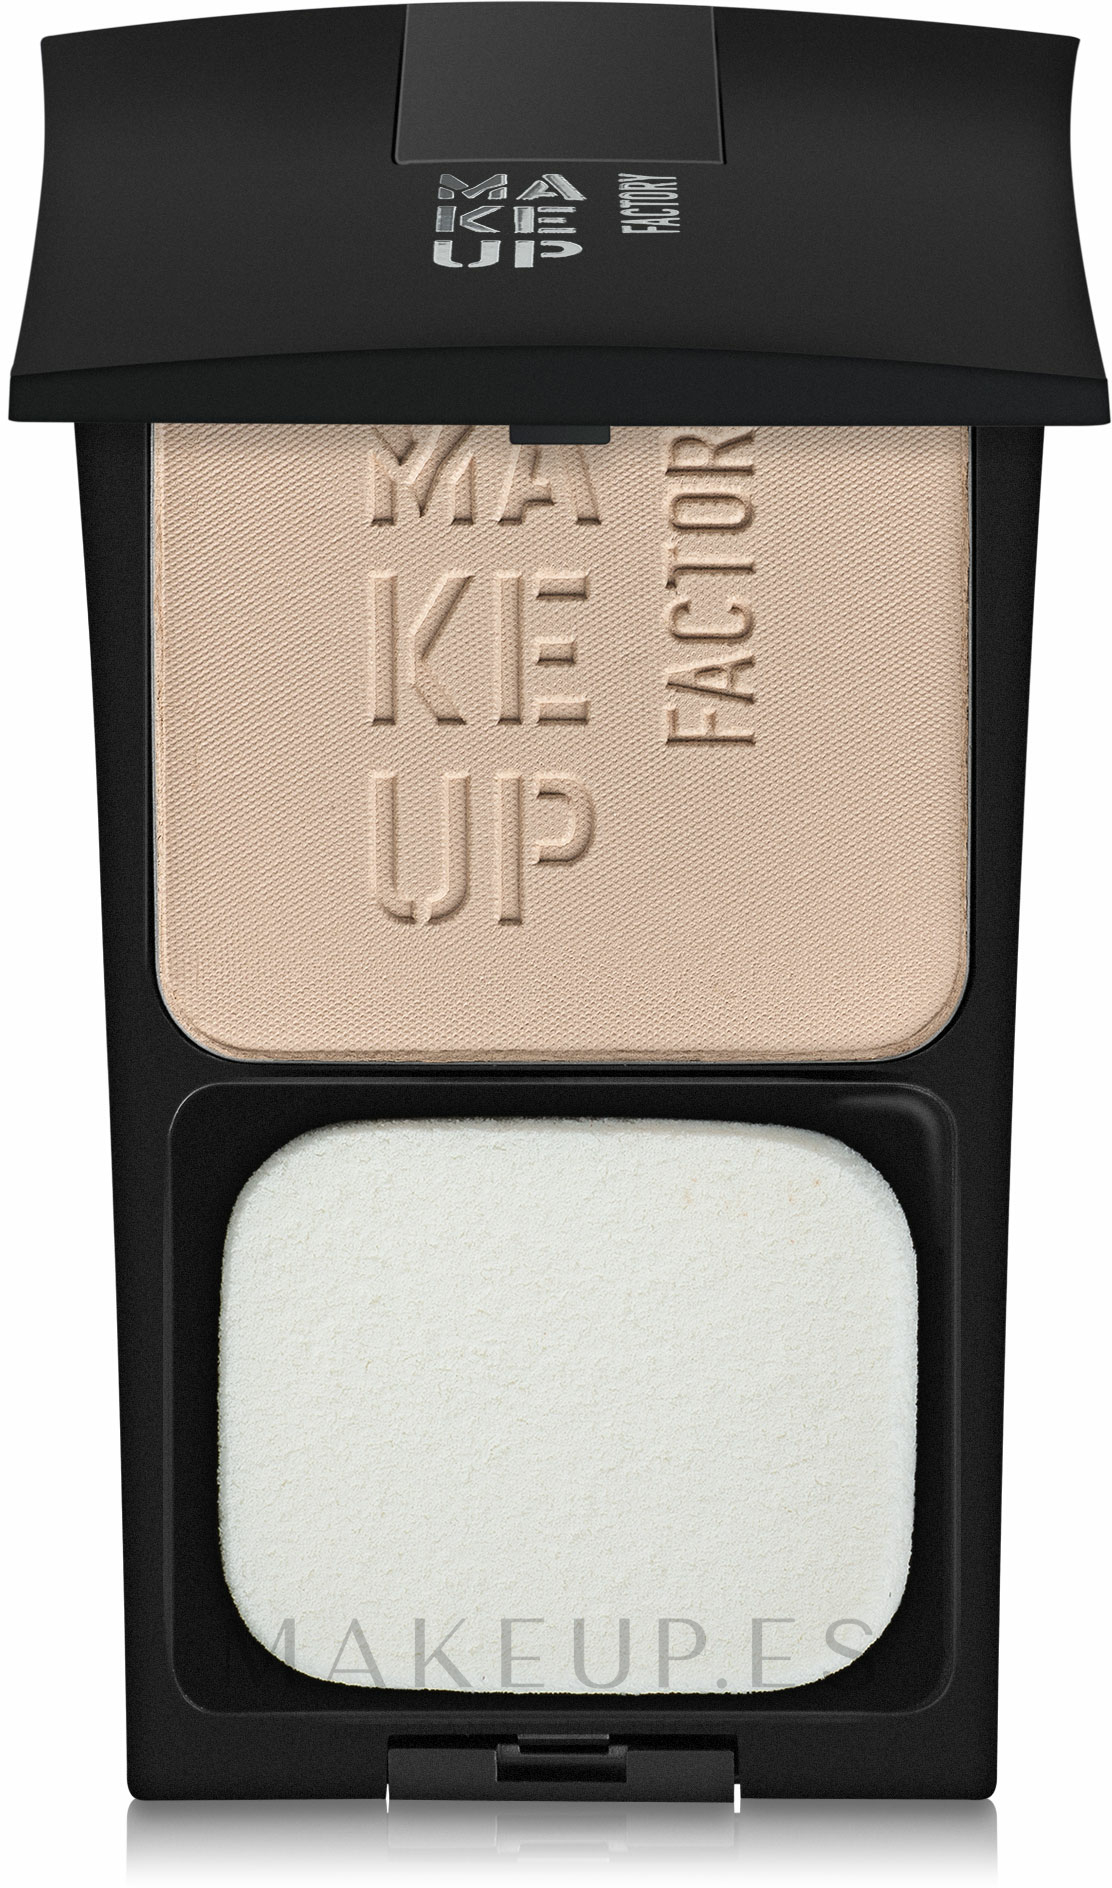 Polvo facial compacto - Make Up Factory Compact Powder — imagen 02 - Light Beige